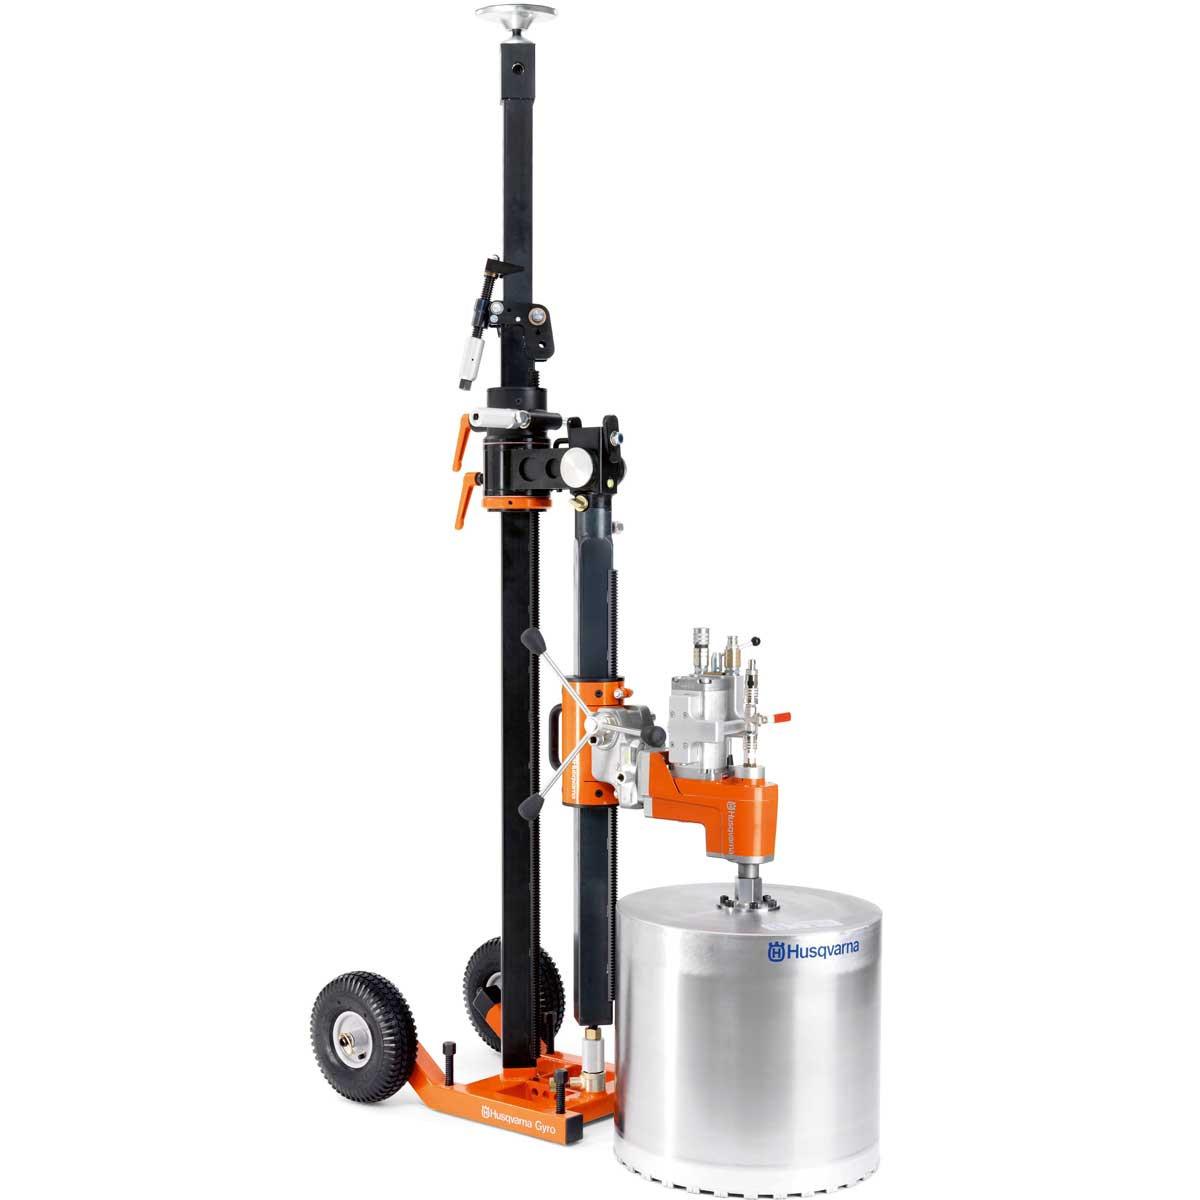 DM 406 H Hydraulic Drill stand